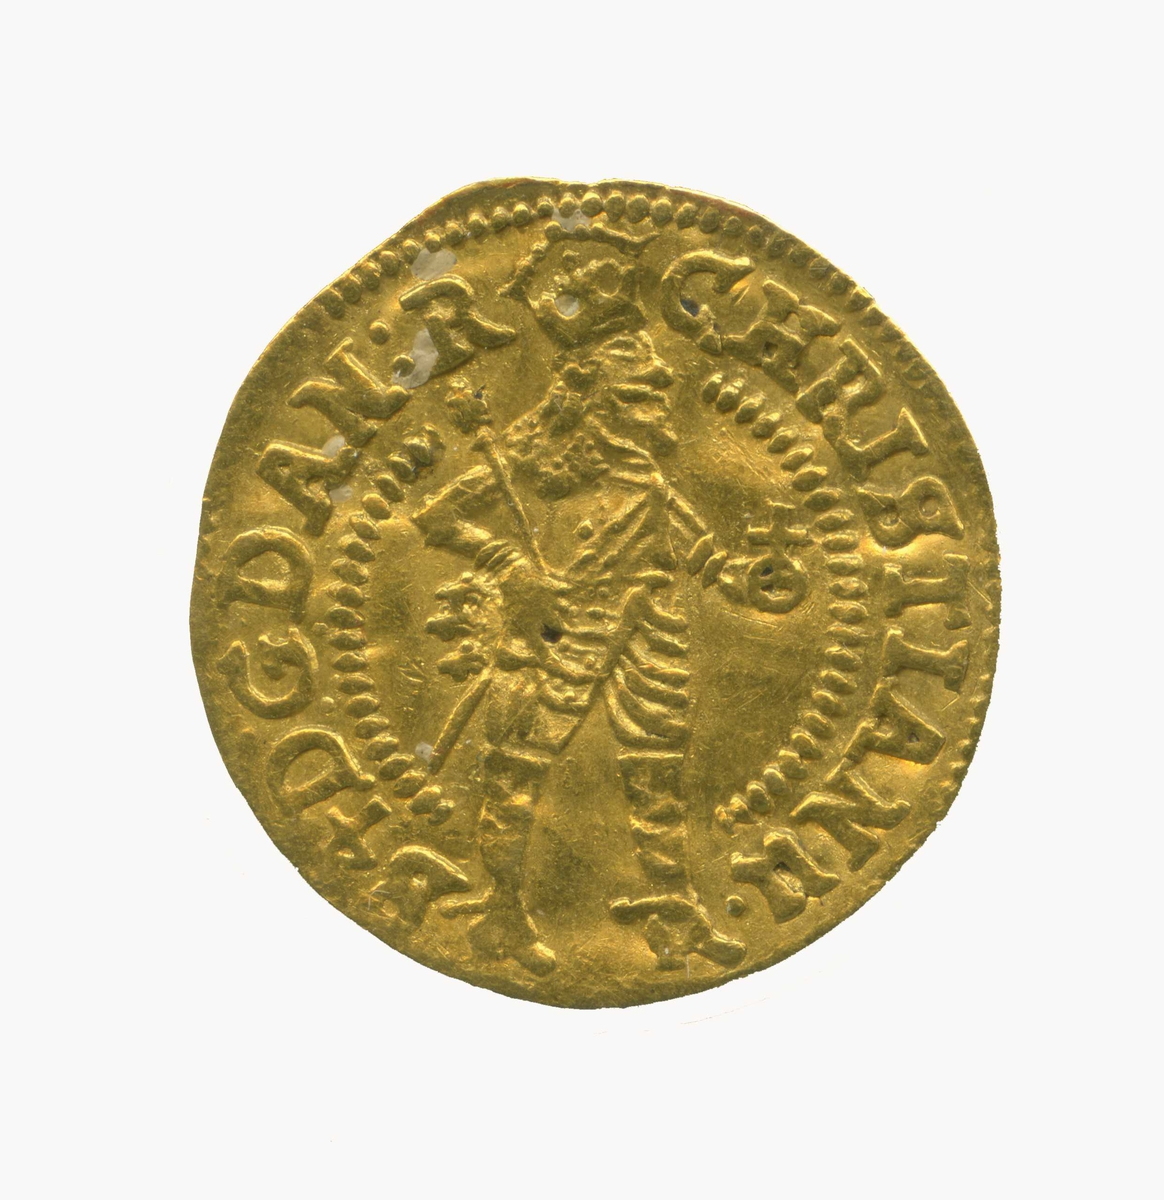 Adv. Konge med krone, septer og rikseple. Rev. Brille over tekst på den ene siden.